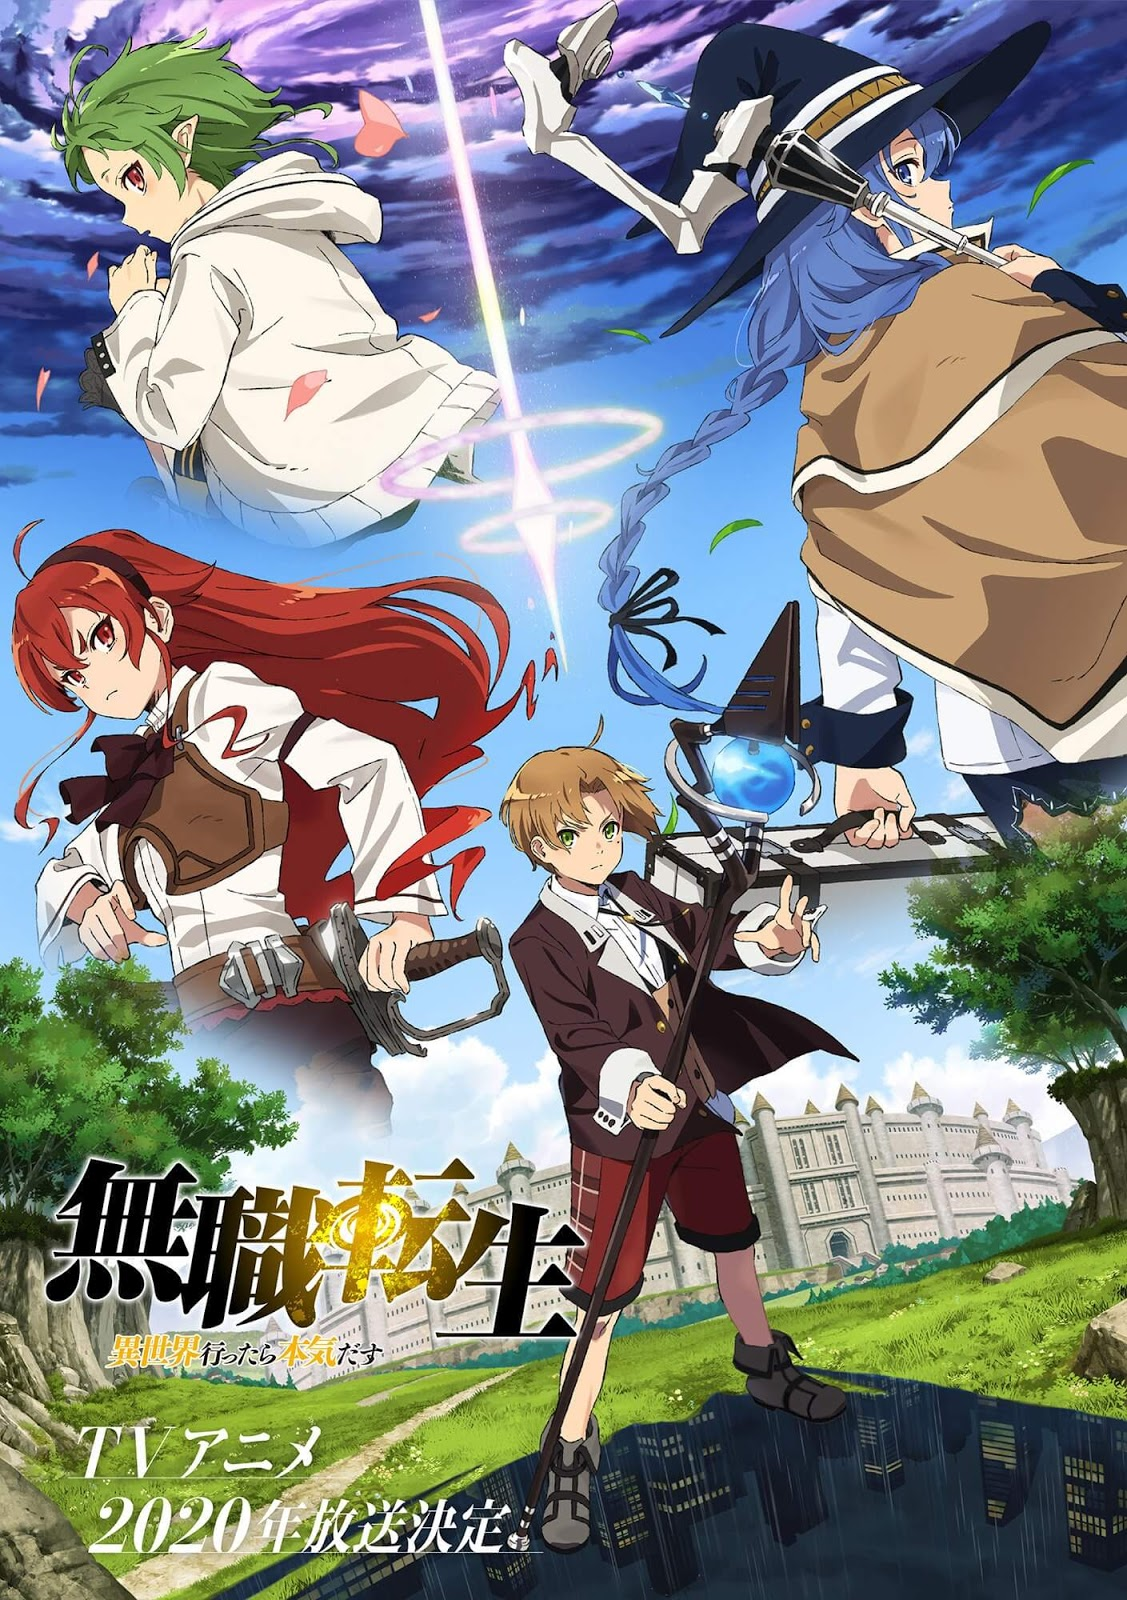 Mushoku Tensei Isekai Ittara Honki Dasu / Jobless Reincarnation caoa do anime com Rudeus, Roxy, Eris e Sylphie